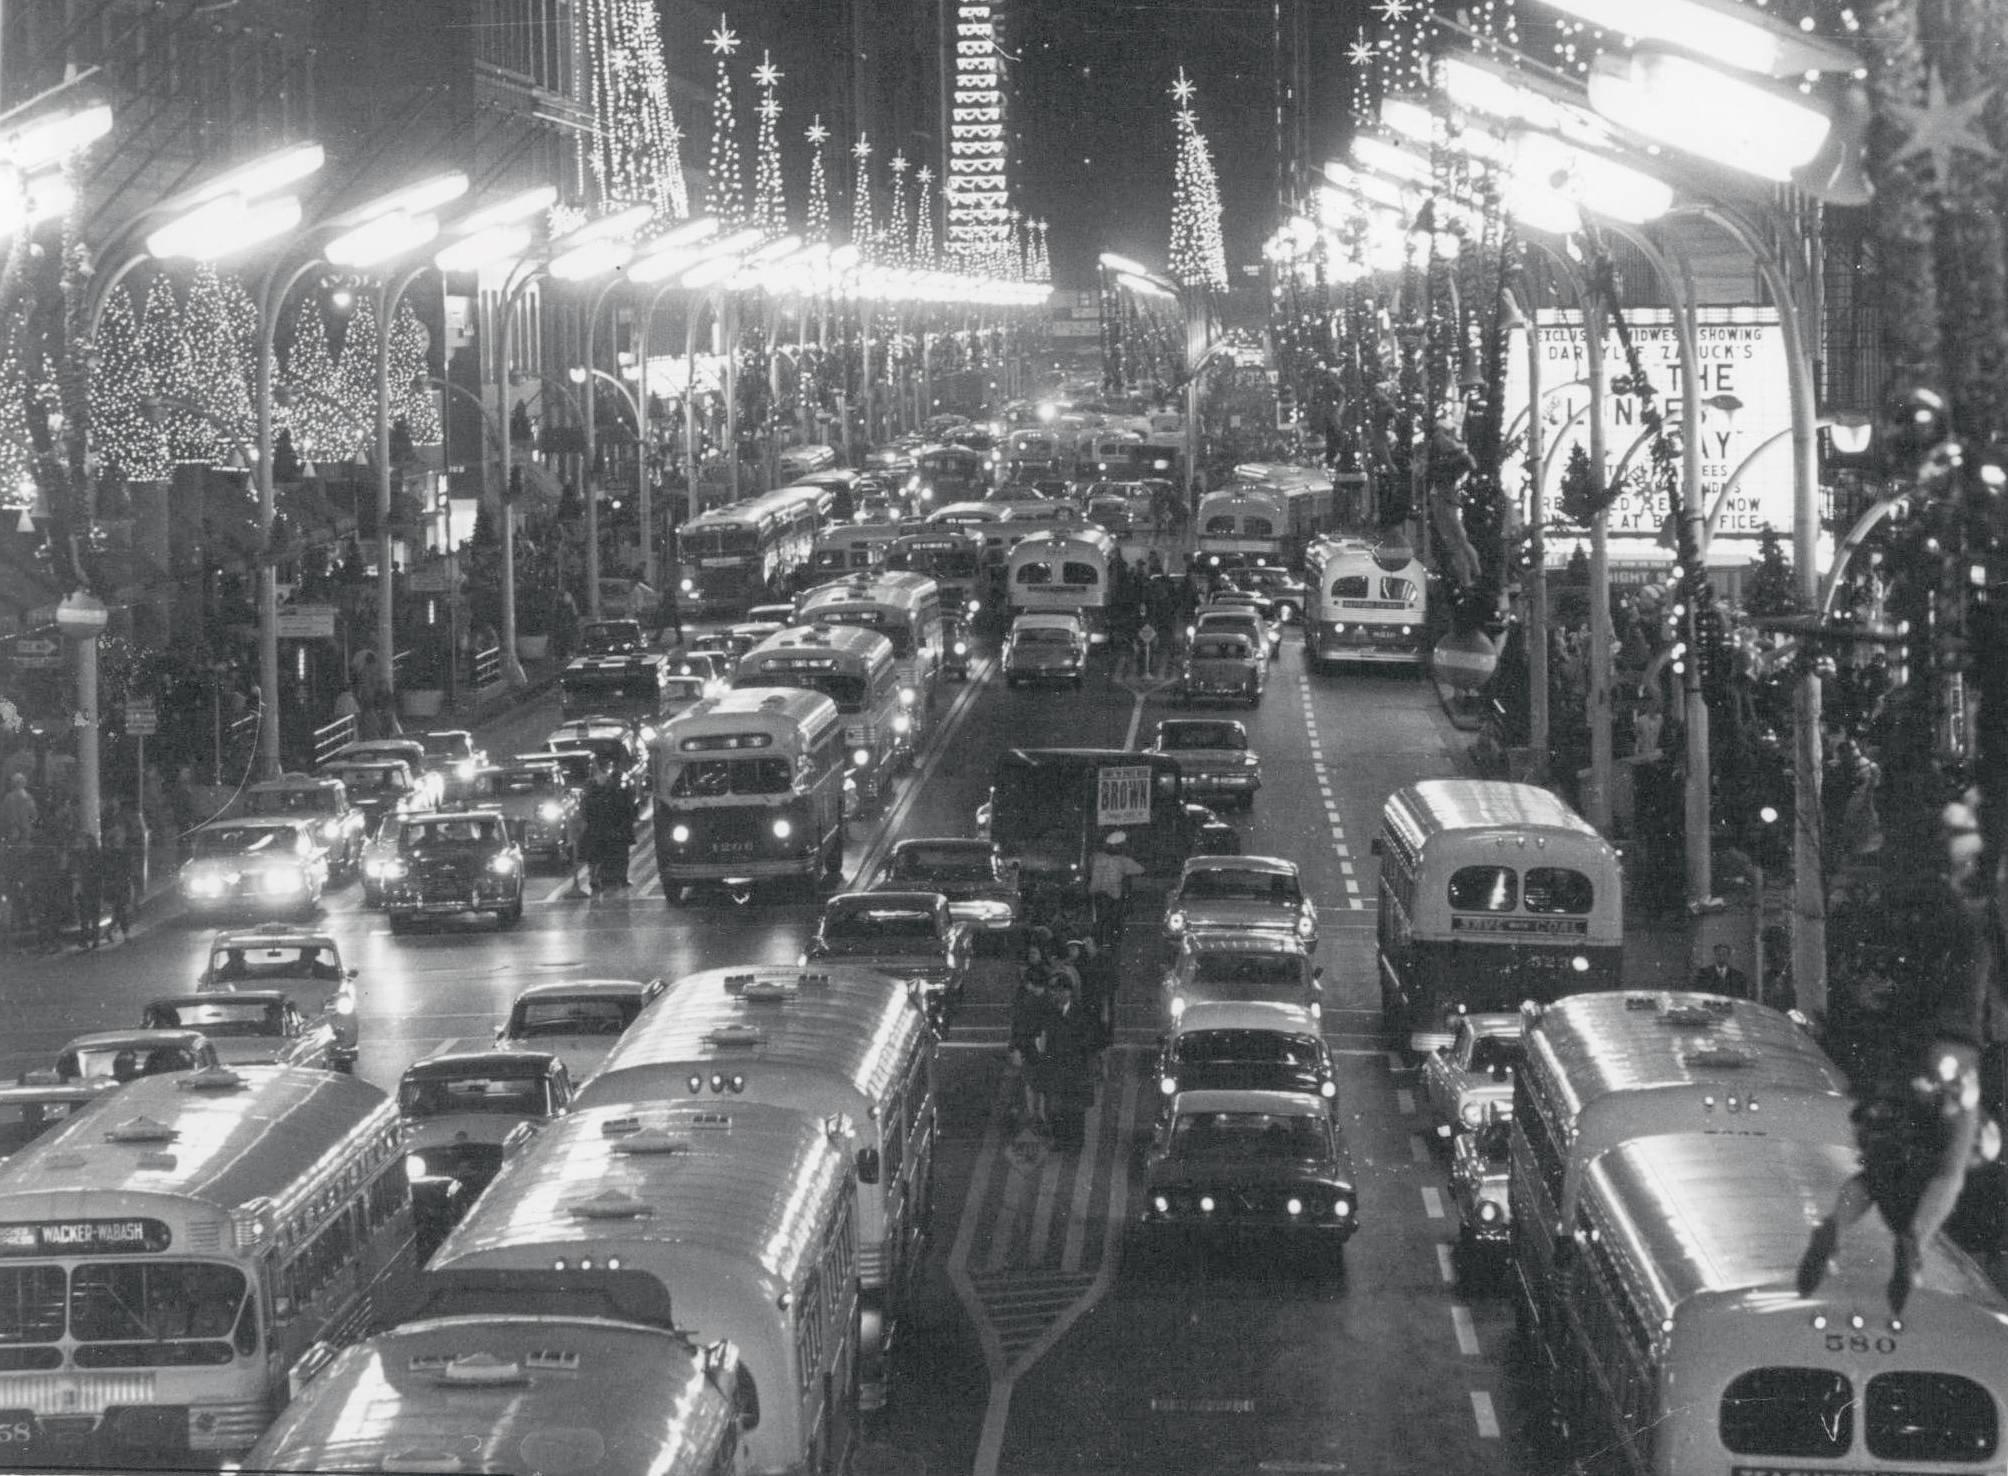 PHOTO CHICAGO STATE STREET CHRISTMAS SEASON NIGHT